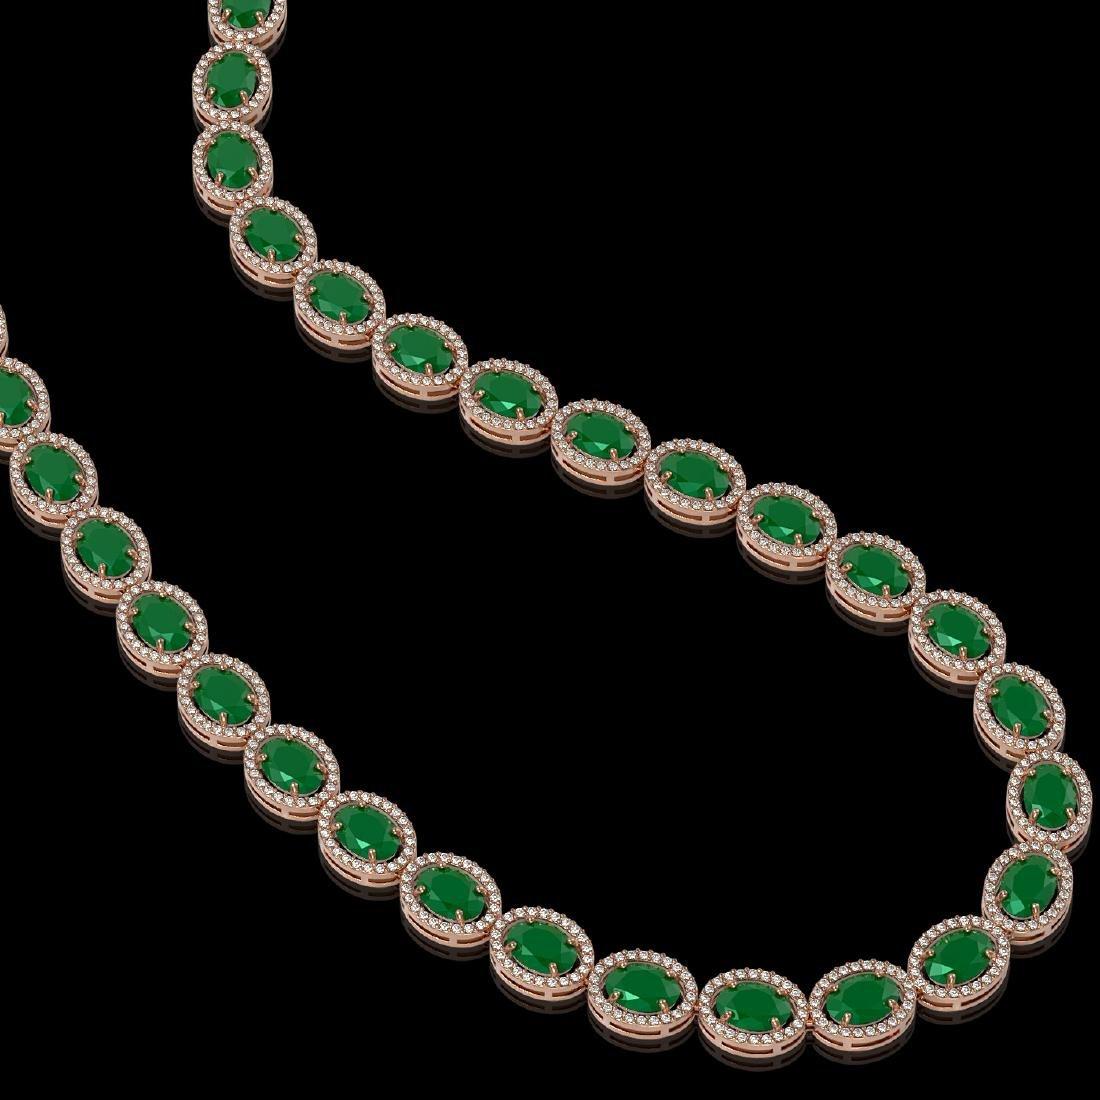 52.15 CTW Emerald & Diamond Halo Necklace 10K Rose Gold - 2